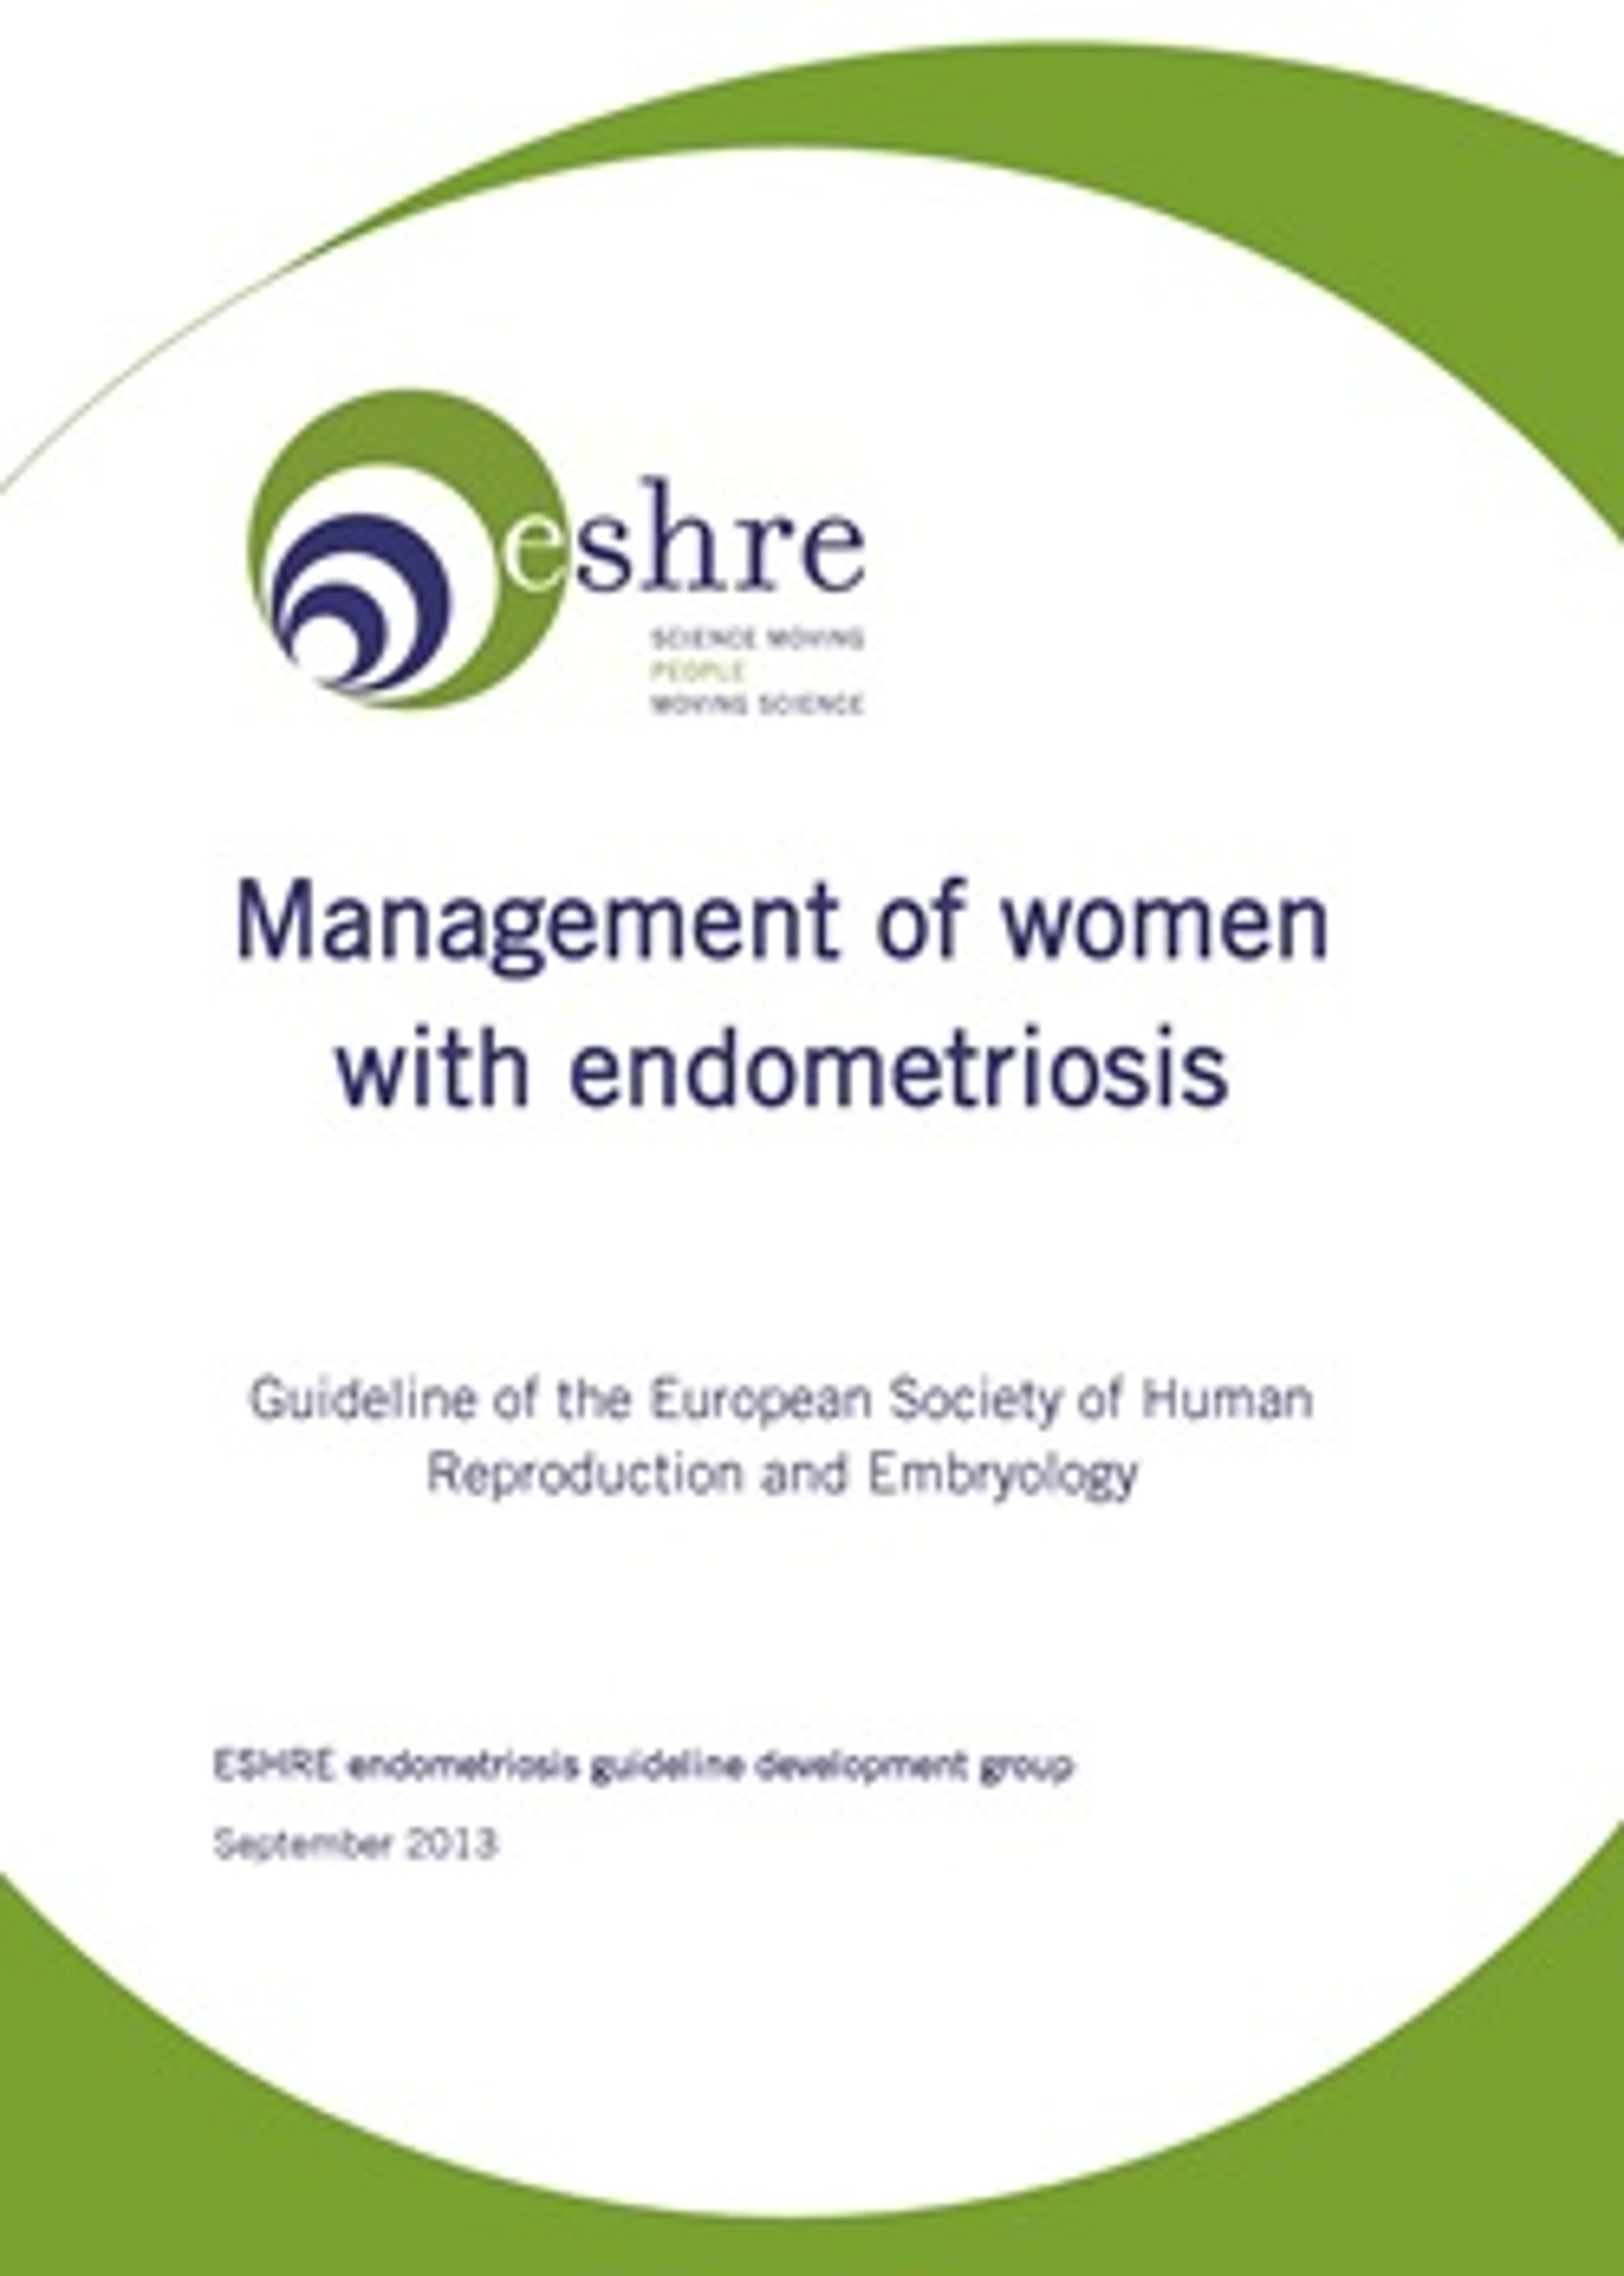 endometriosis guideline